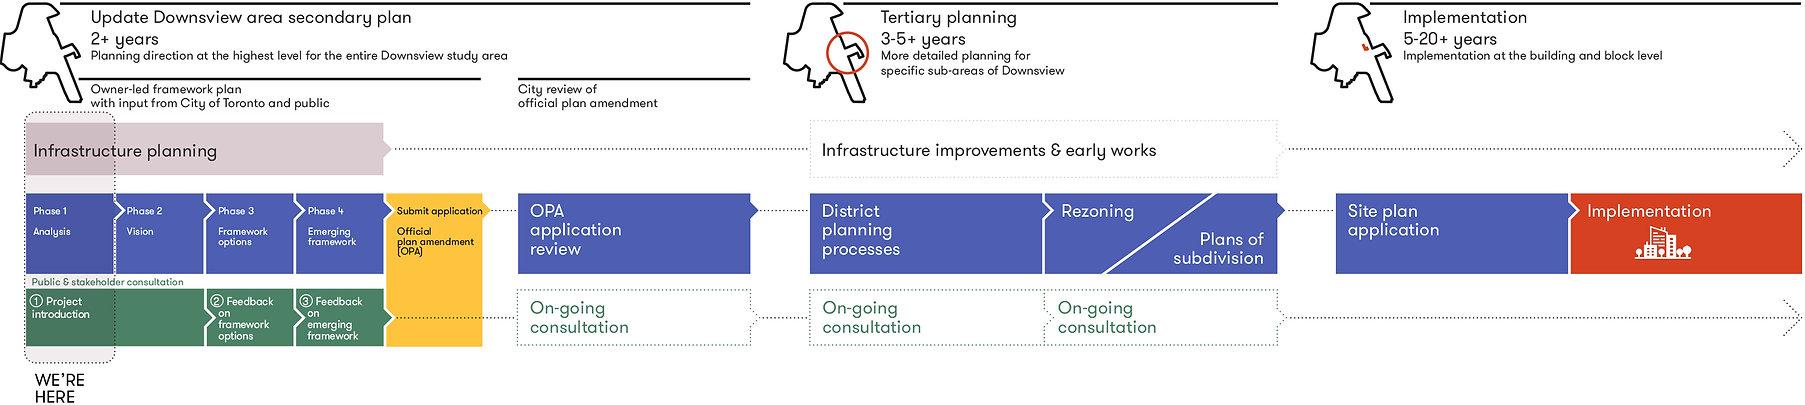 2020-05-04-Diagram_Timeline.jpg